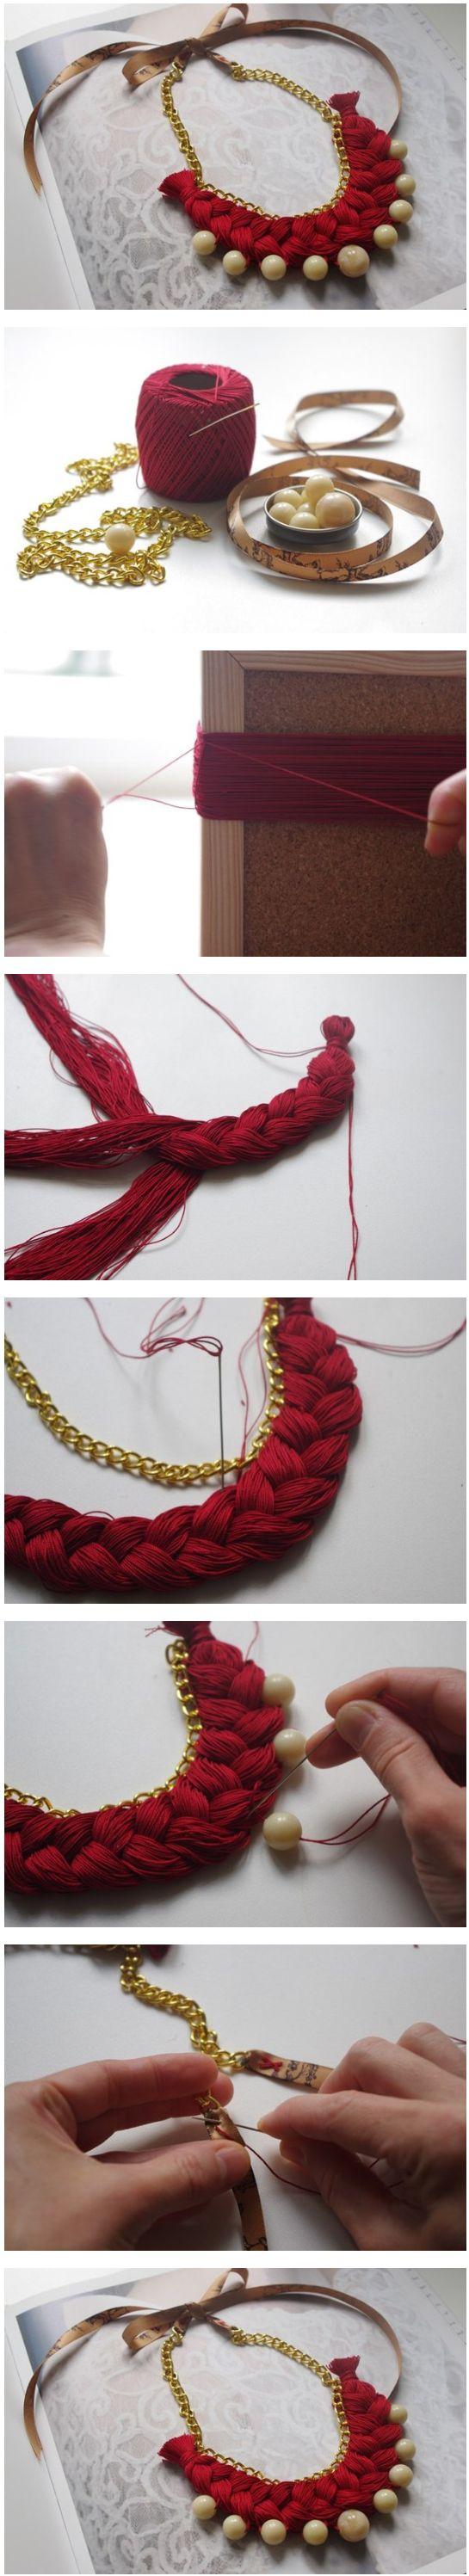 DIY collar hilo